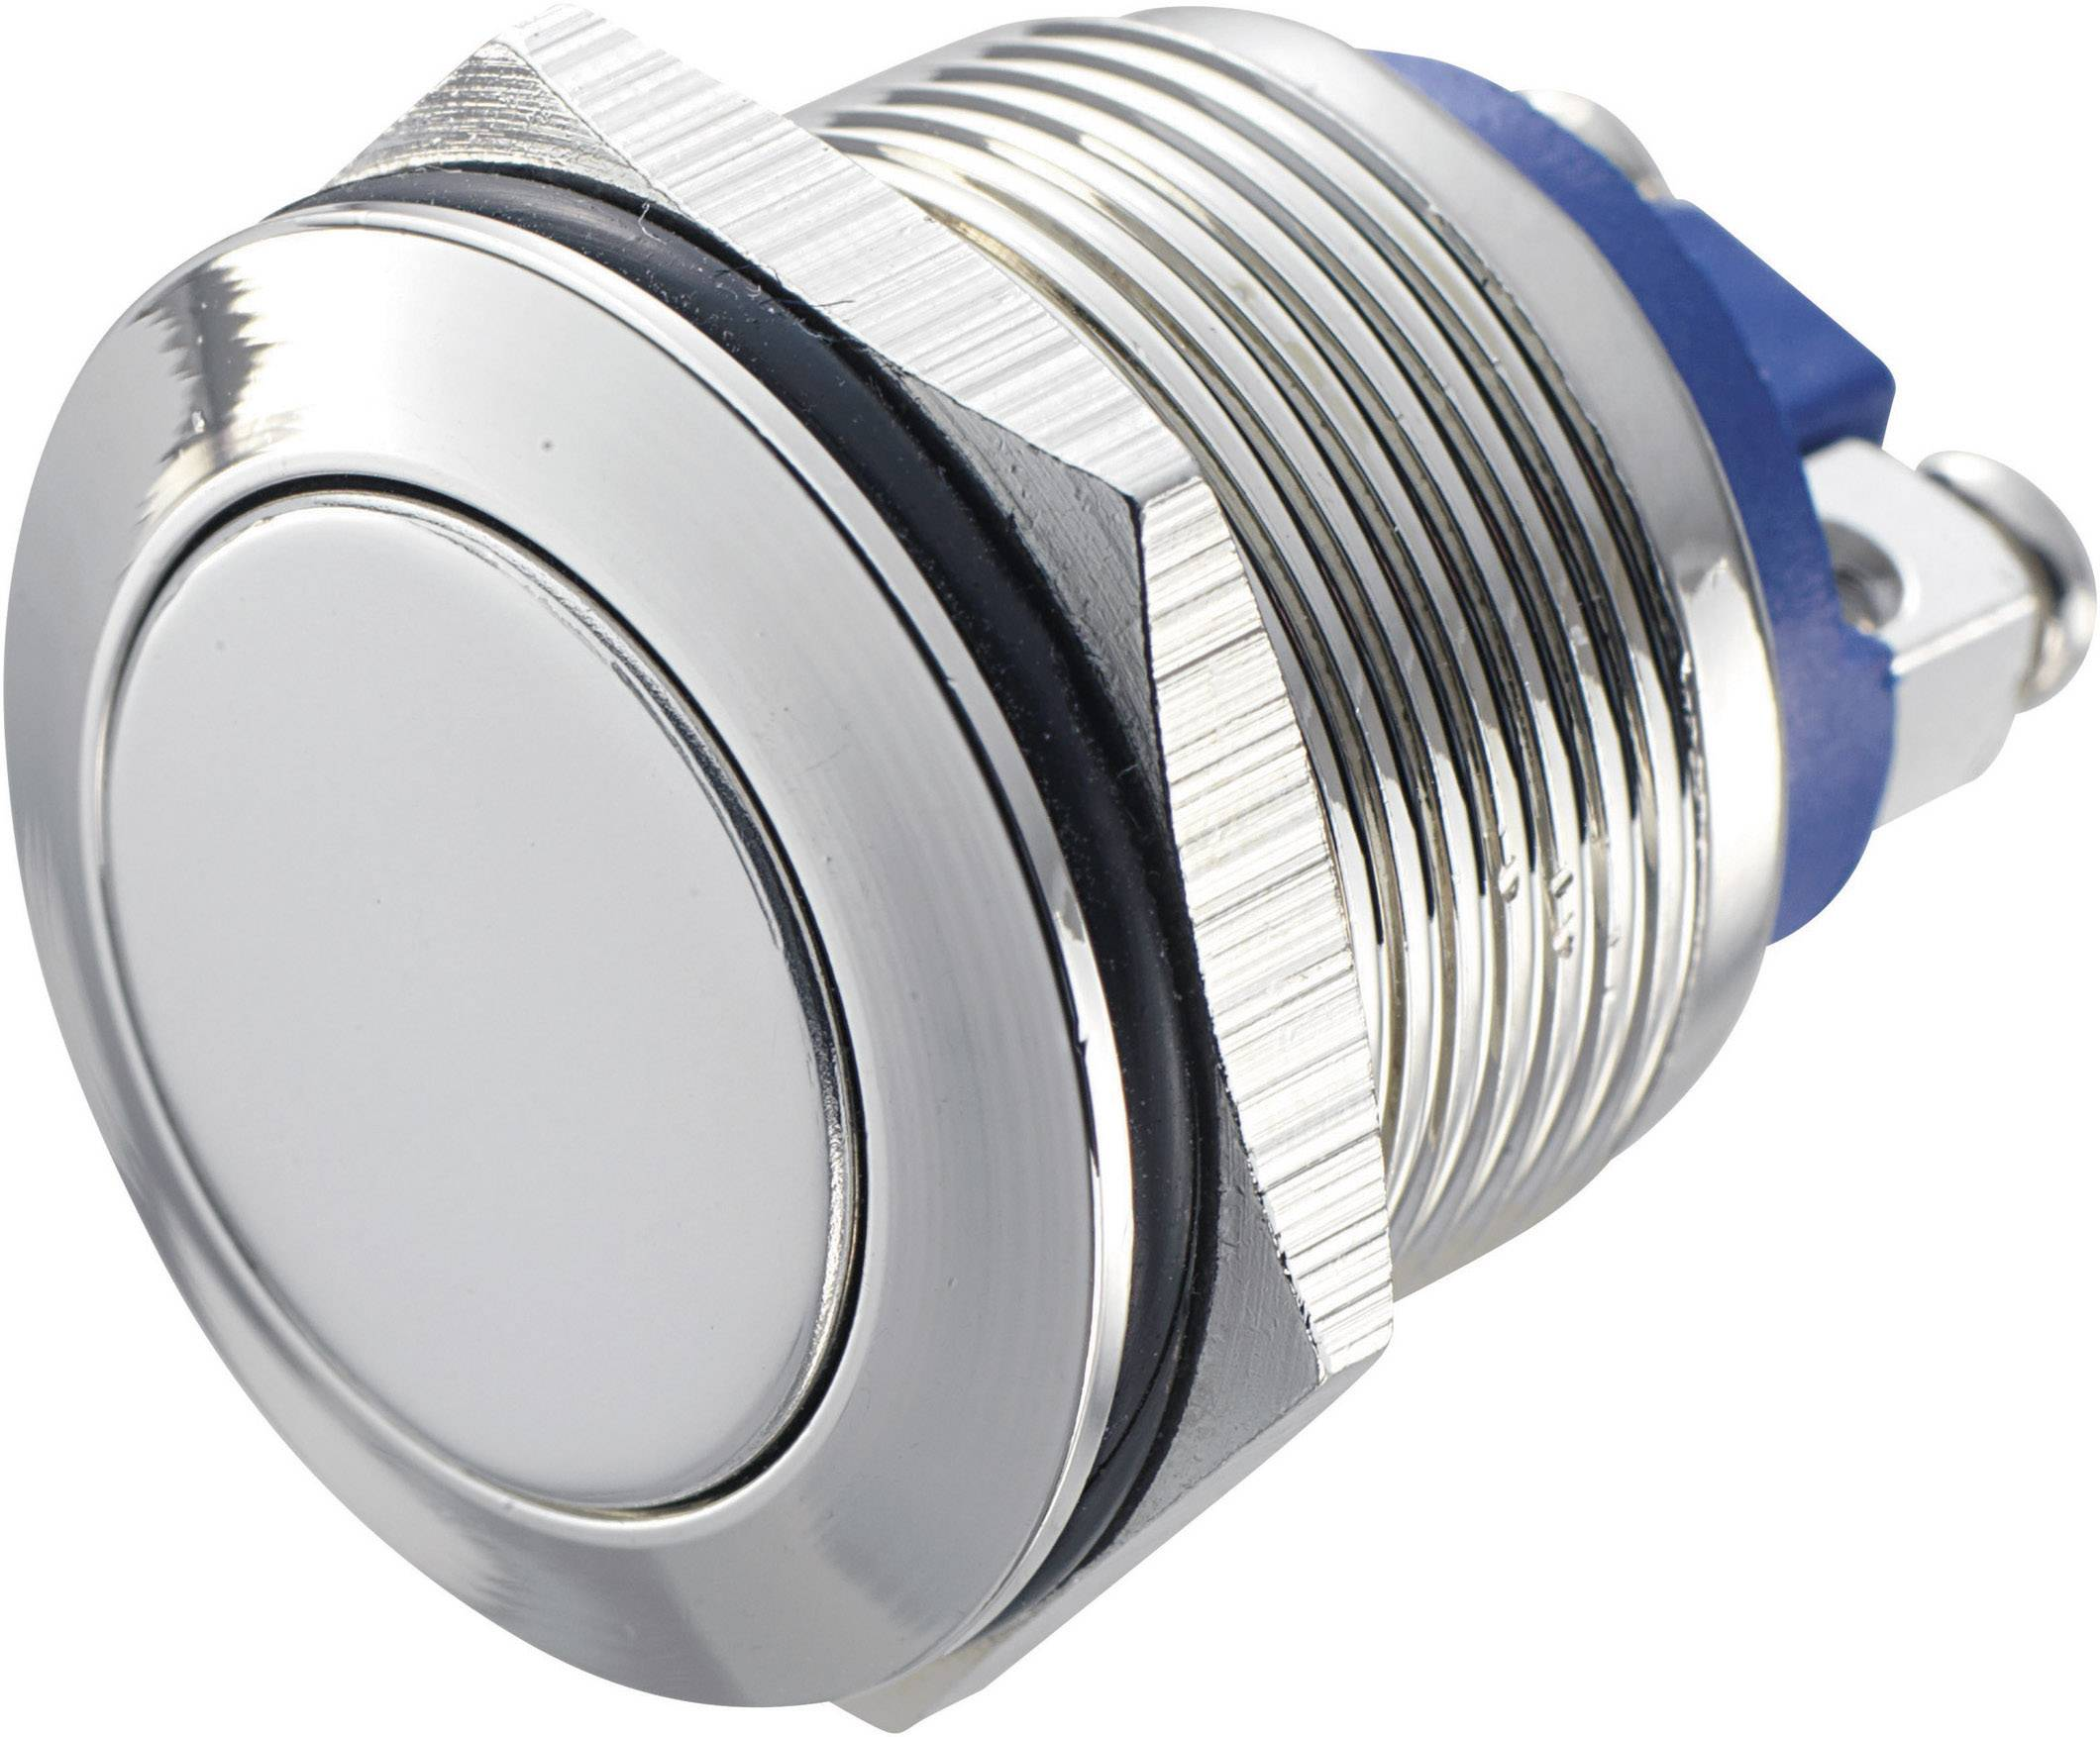 Tlačítko antivandal bez aretace TRU COMPONENTS GQ 19F-N, 48 V/DC, 2 A, mosaz, 1x vyp/(zap)